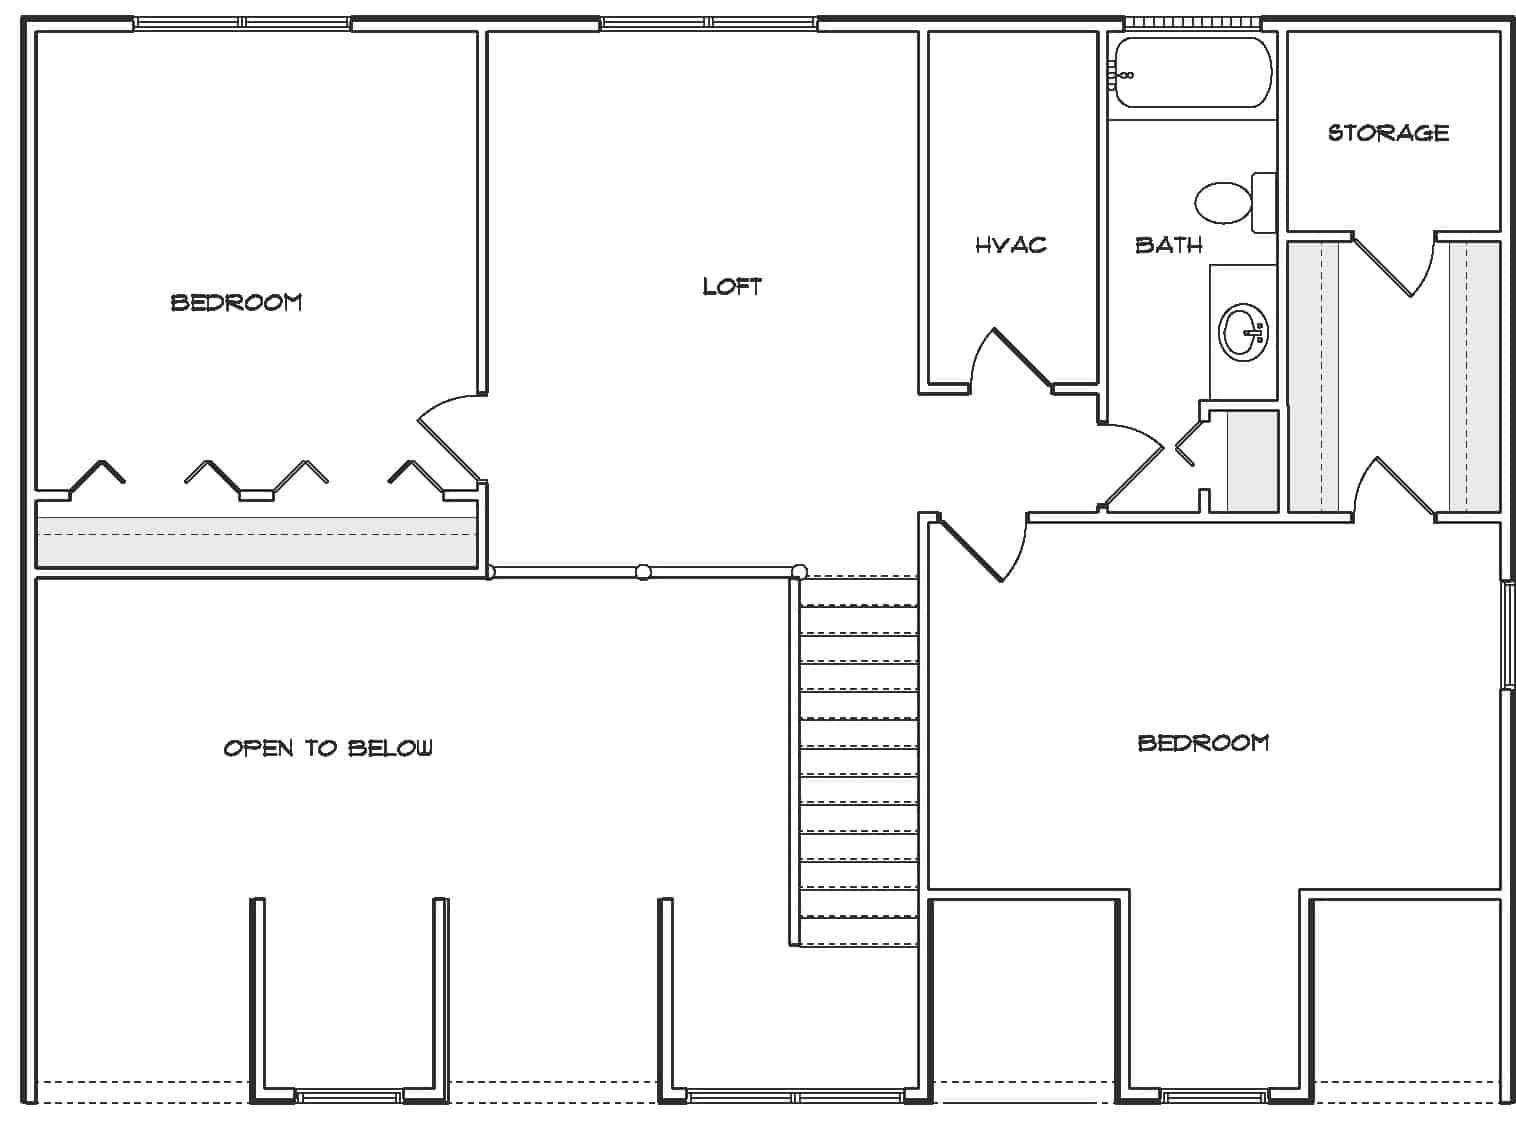 TR-41008 - Blueprint 3